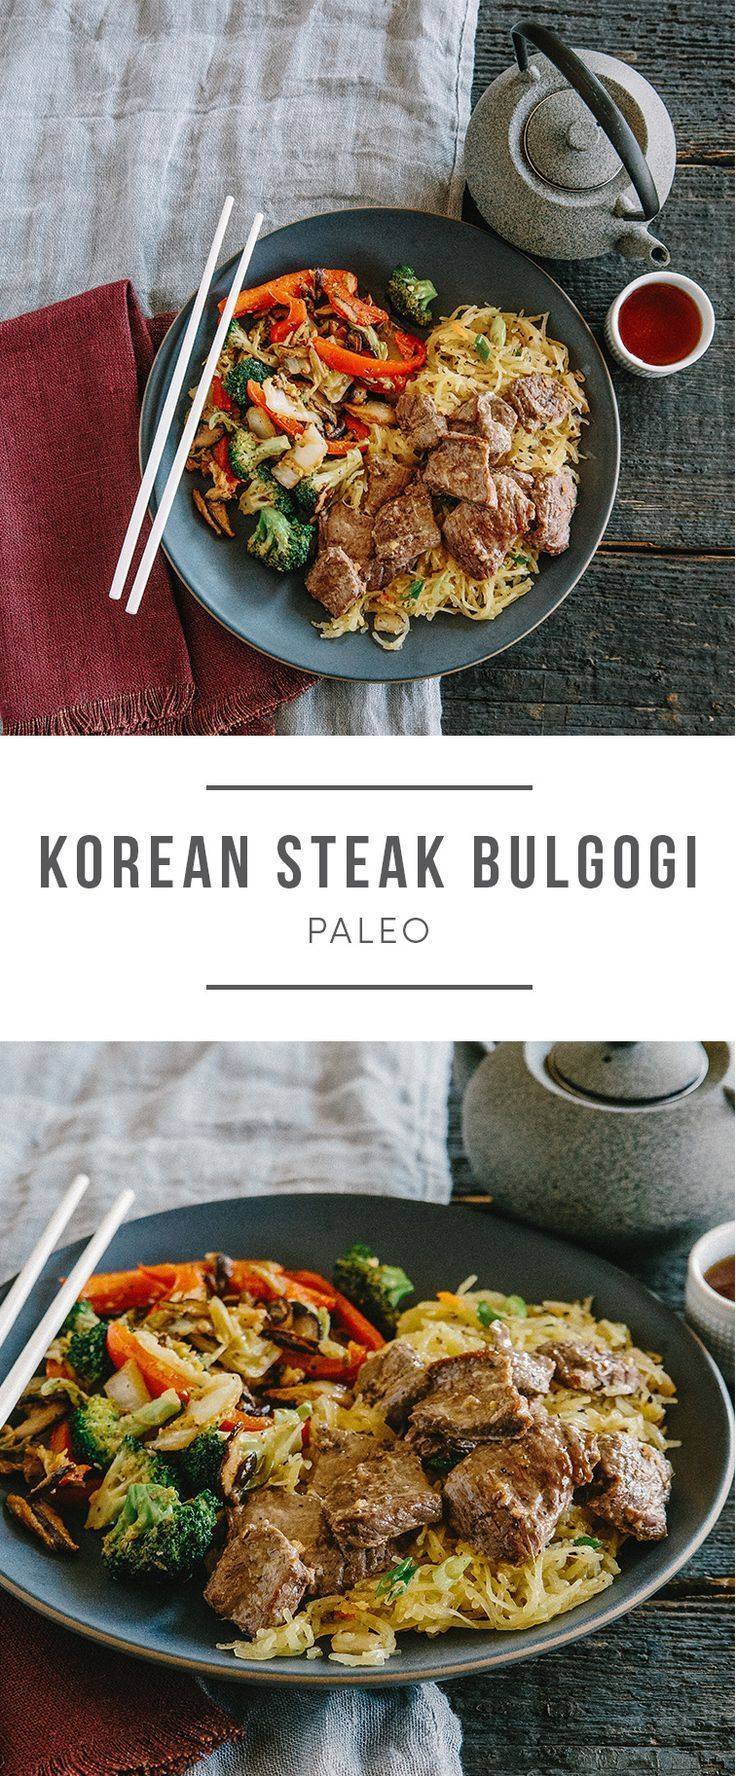 Paleo Koren Steak Bulgogi for asian food lovers. Recipe here: https://greenchef.com/recipes/paleo-korean-bulgogi-steak-with-spaghetti-squash-kimchi-noodles-stir?utm_source=pinterest&utm_medium=link&utm_campaign=social&utm_content=paleo-korean-bulogi